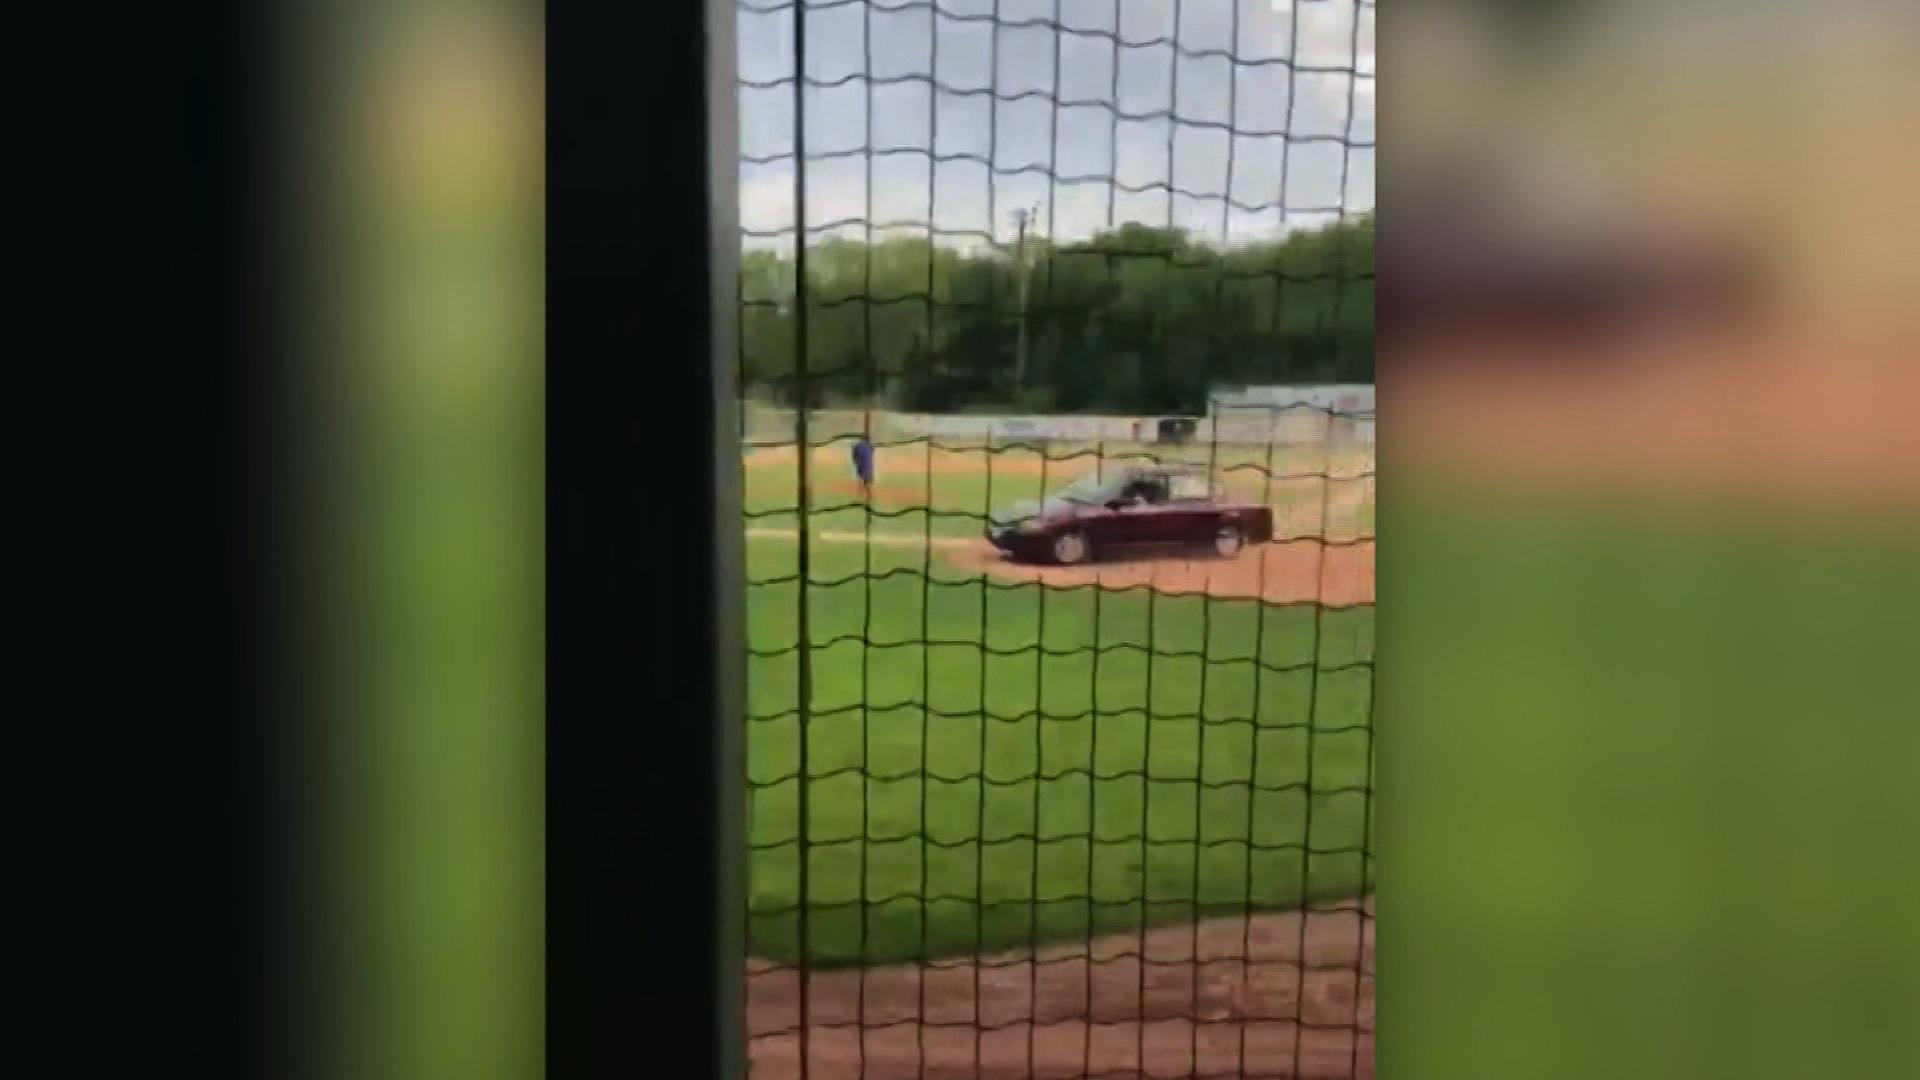 Police car barrels onto baseball field kills man cnn video malvernweather Image collections